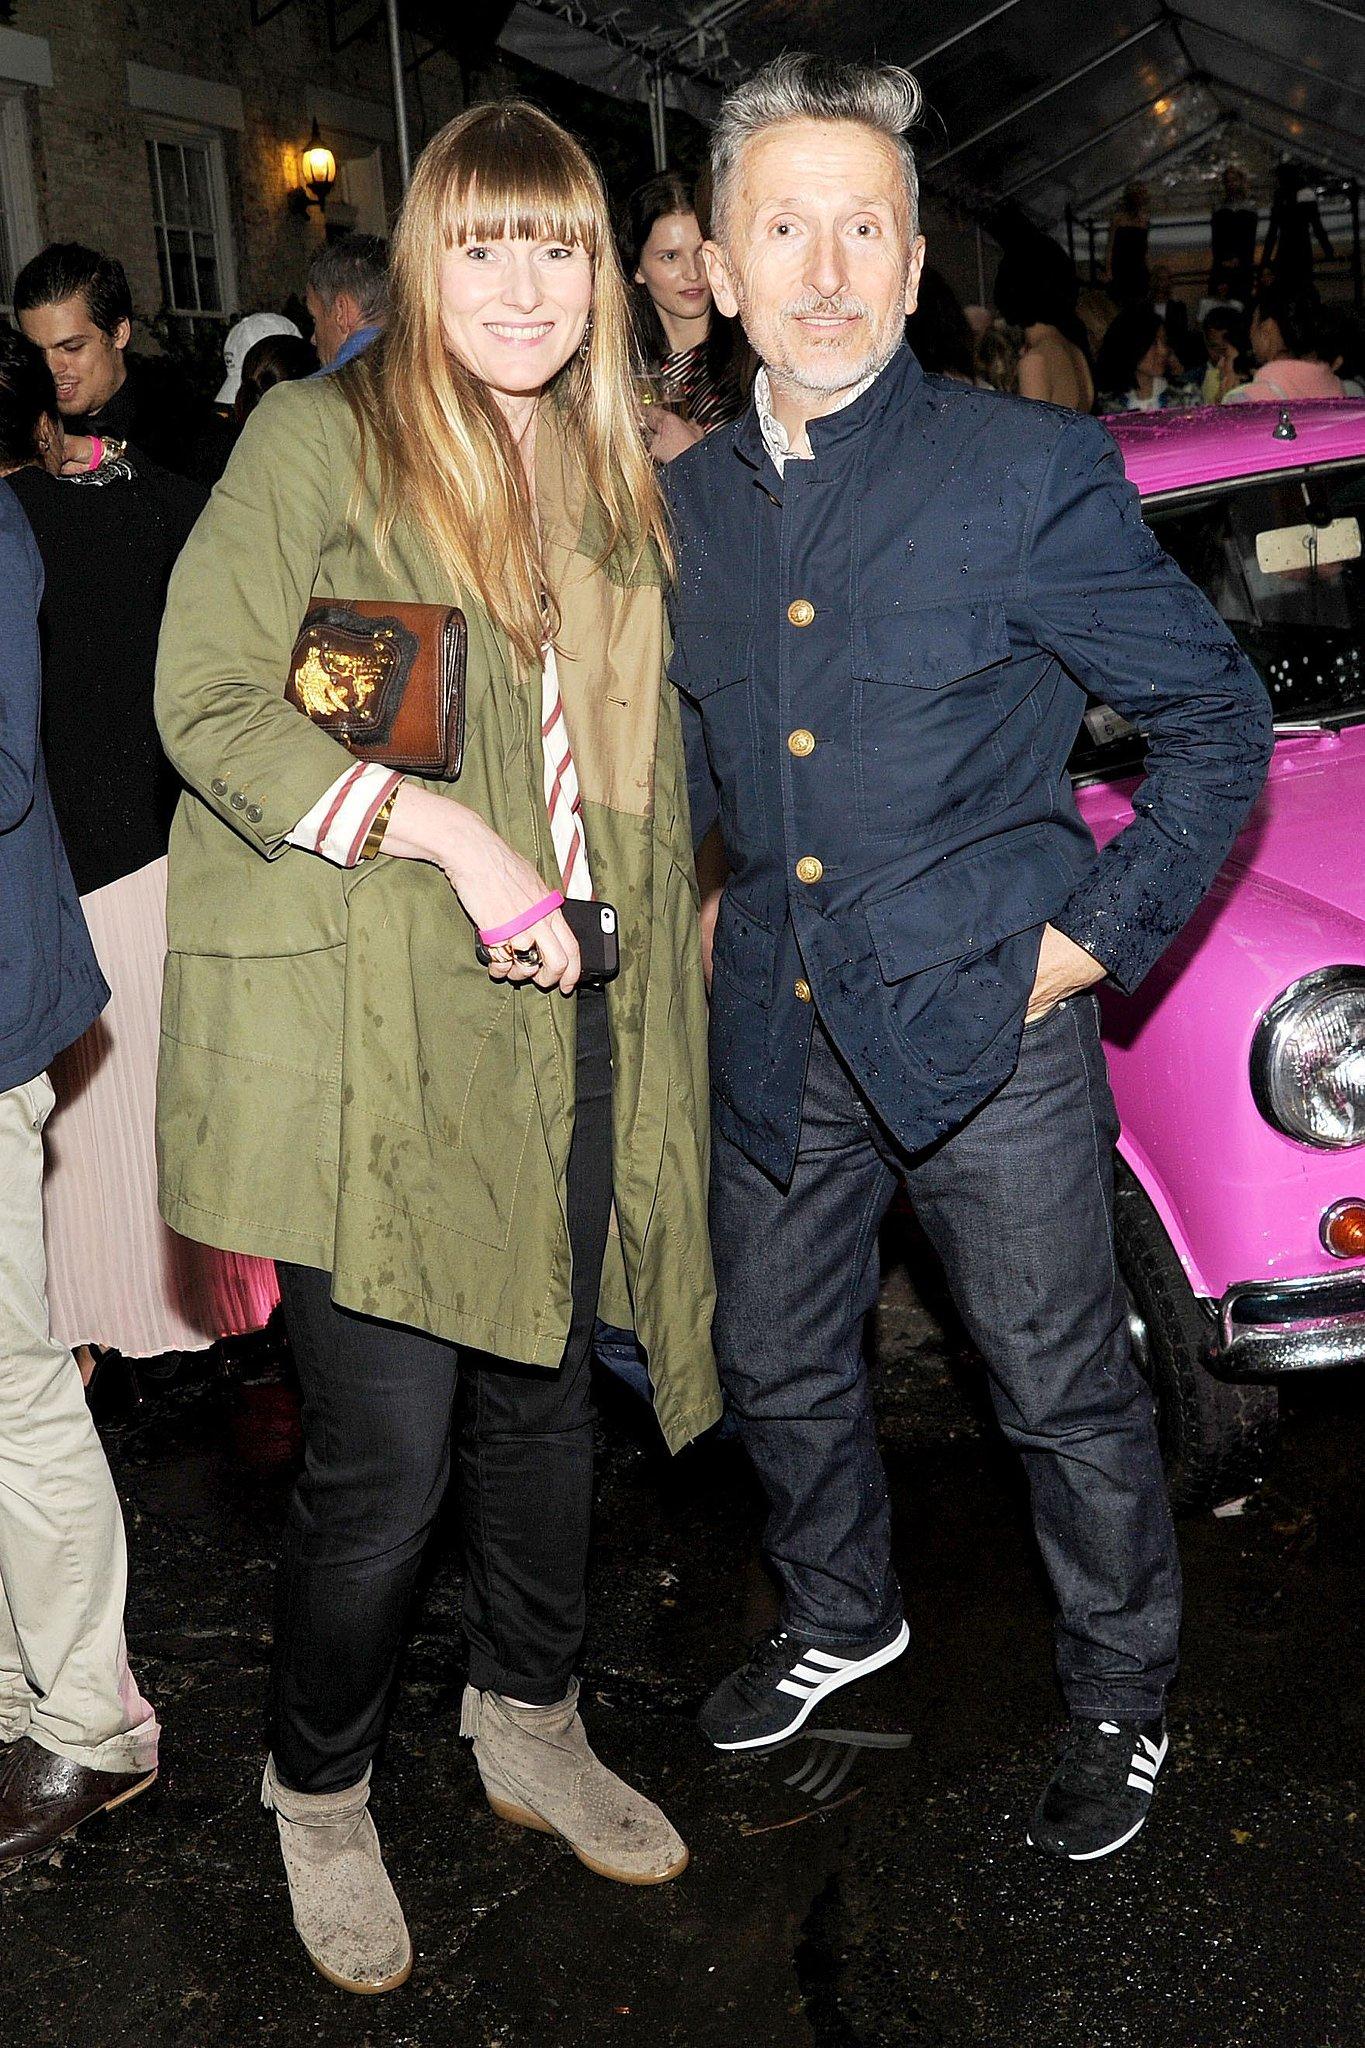 Teen Vogue editor in chief Amy Astley and Simon Doonan at Stella McCartney's Resort 2014 presentation. Source: Billy Farrell/BFAnyc.com